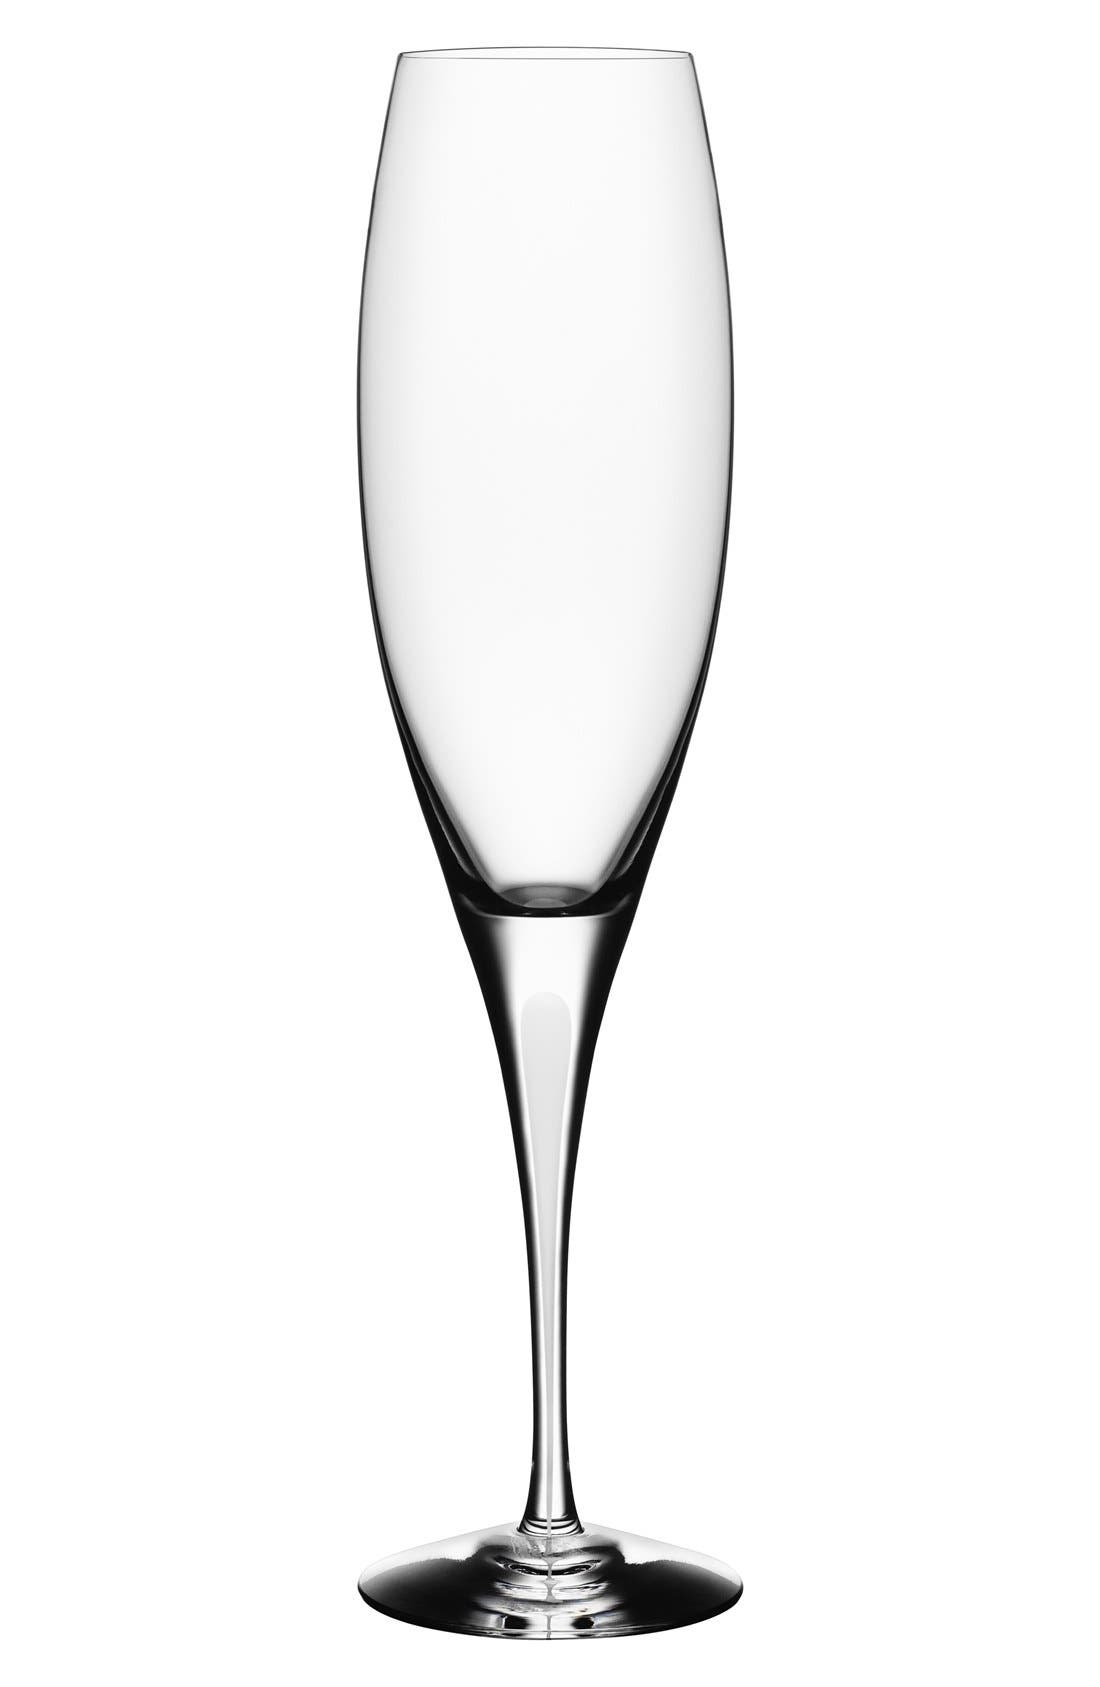 ORREFORS 'Intermezzo' ChampagneFlute